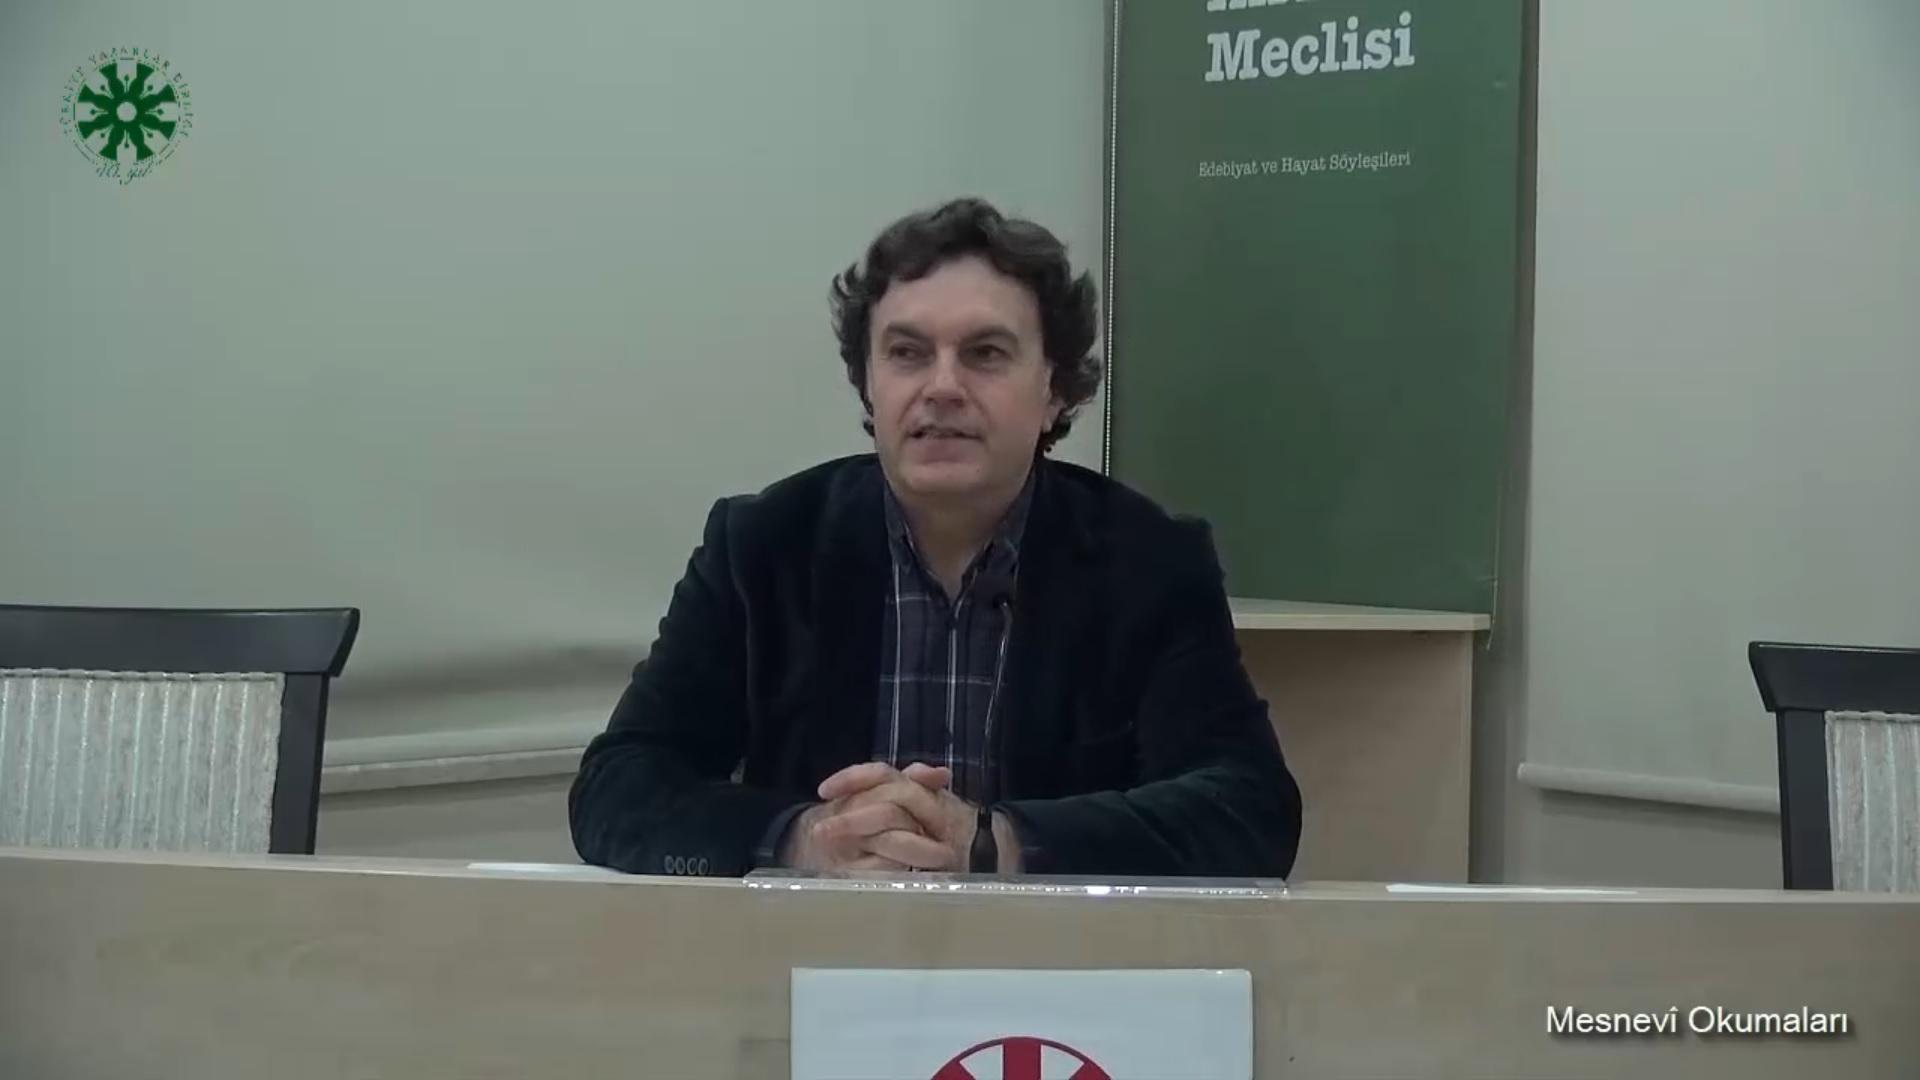 Mesnevî Okumaları - 6 - Prof. Dr. Hicabi Kırlangıç (video)